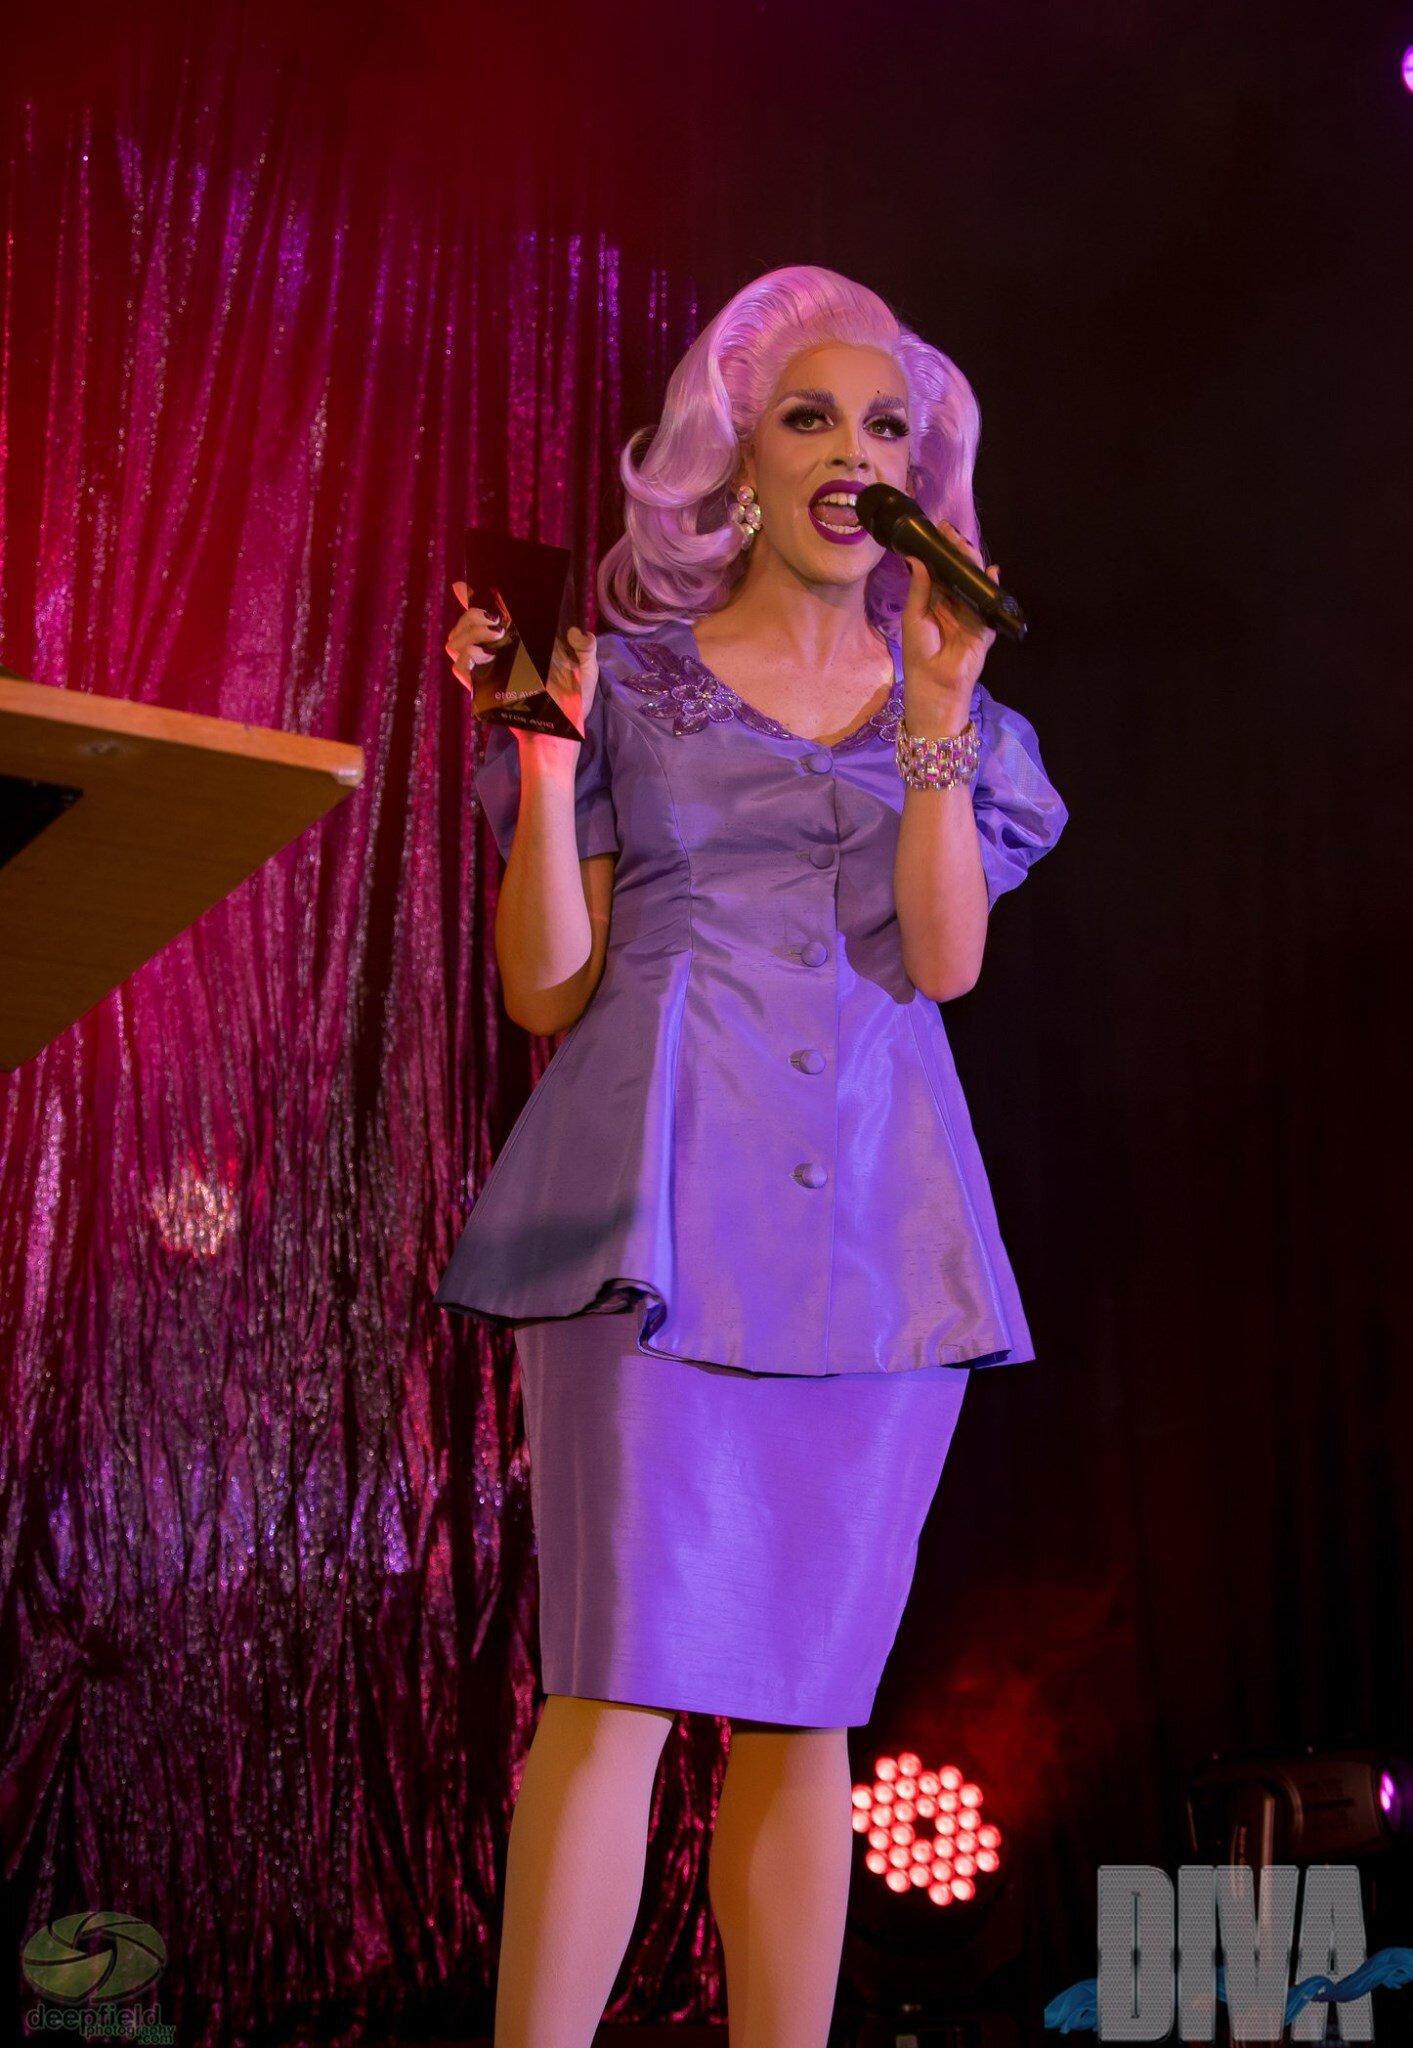 fran-giapanni-rising-star-win-diva-awards-sydney-drag-queen-royalty-best-hire-drag-race-australia.jpg